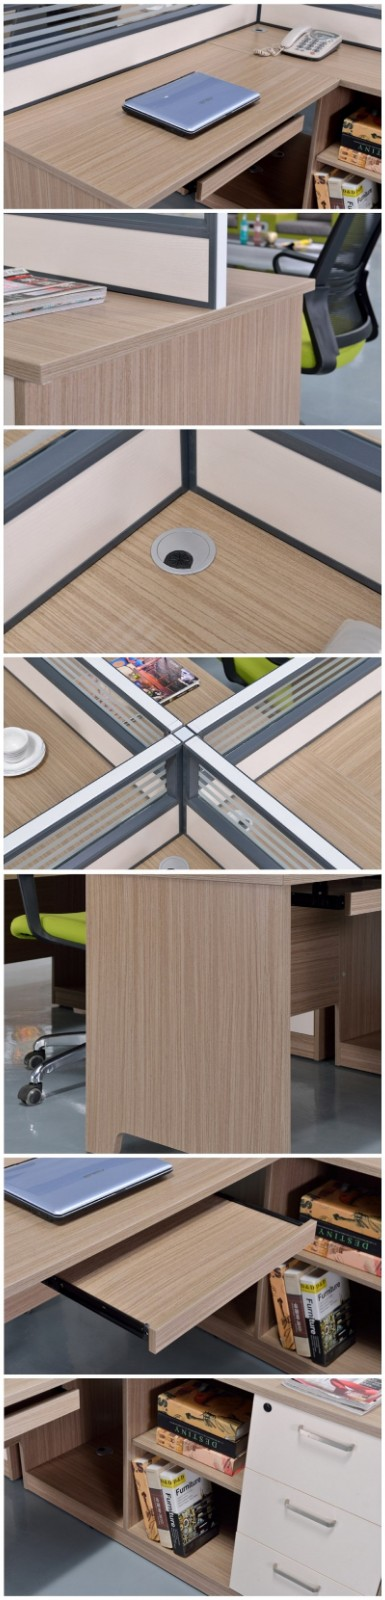 EBUNGE-Movable Partition Manufacturer, Foldable Partition Doors | Ebunge-2